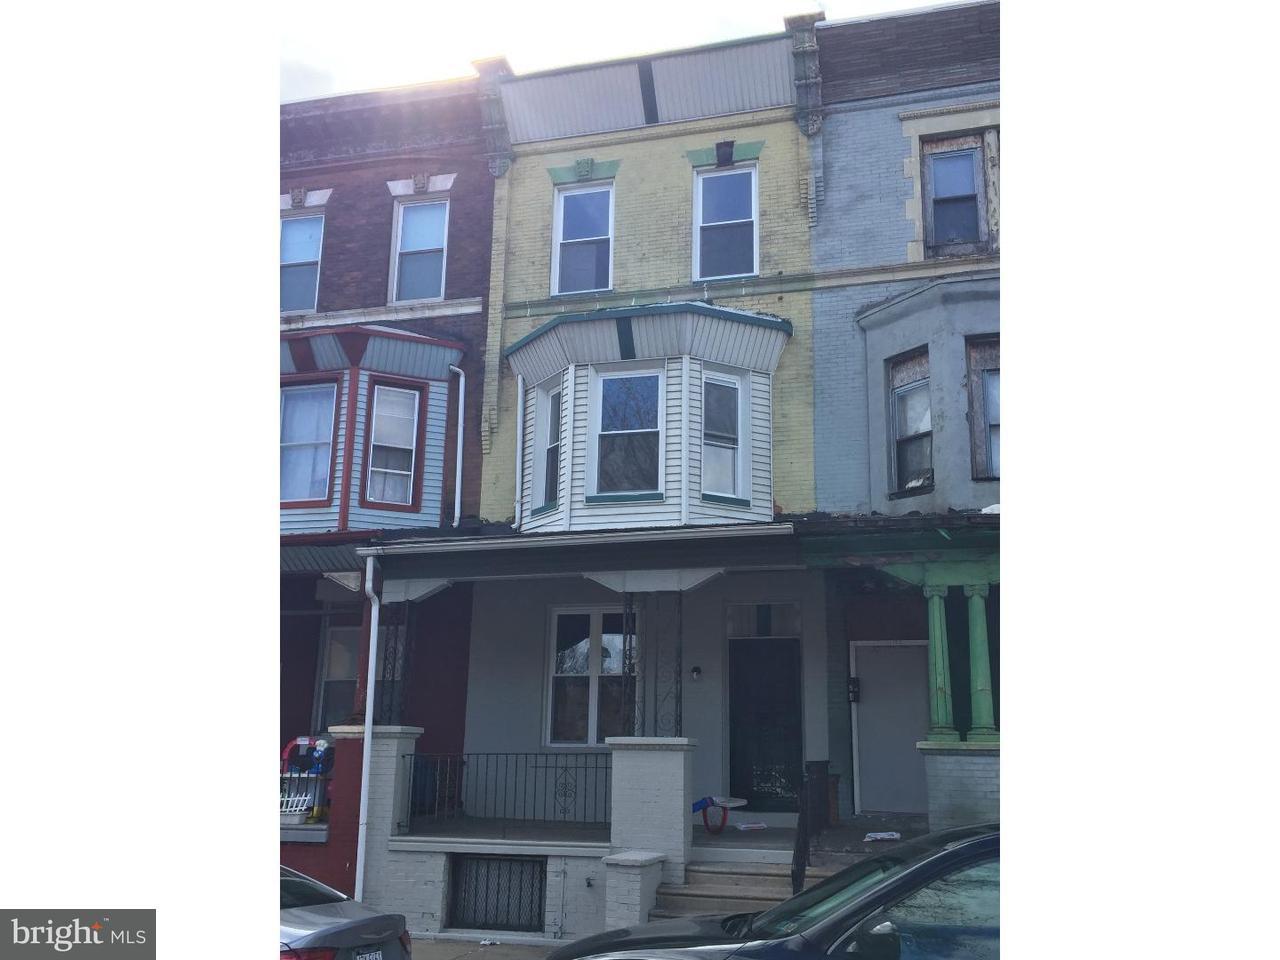 2238 W Lehigh Philadelphia, PA 19132